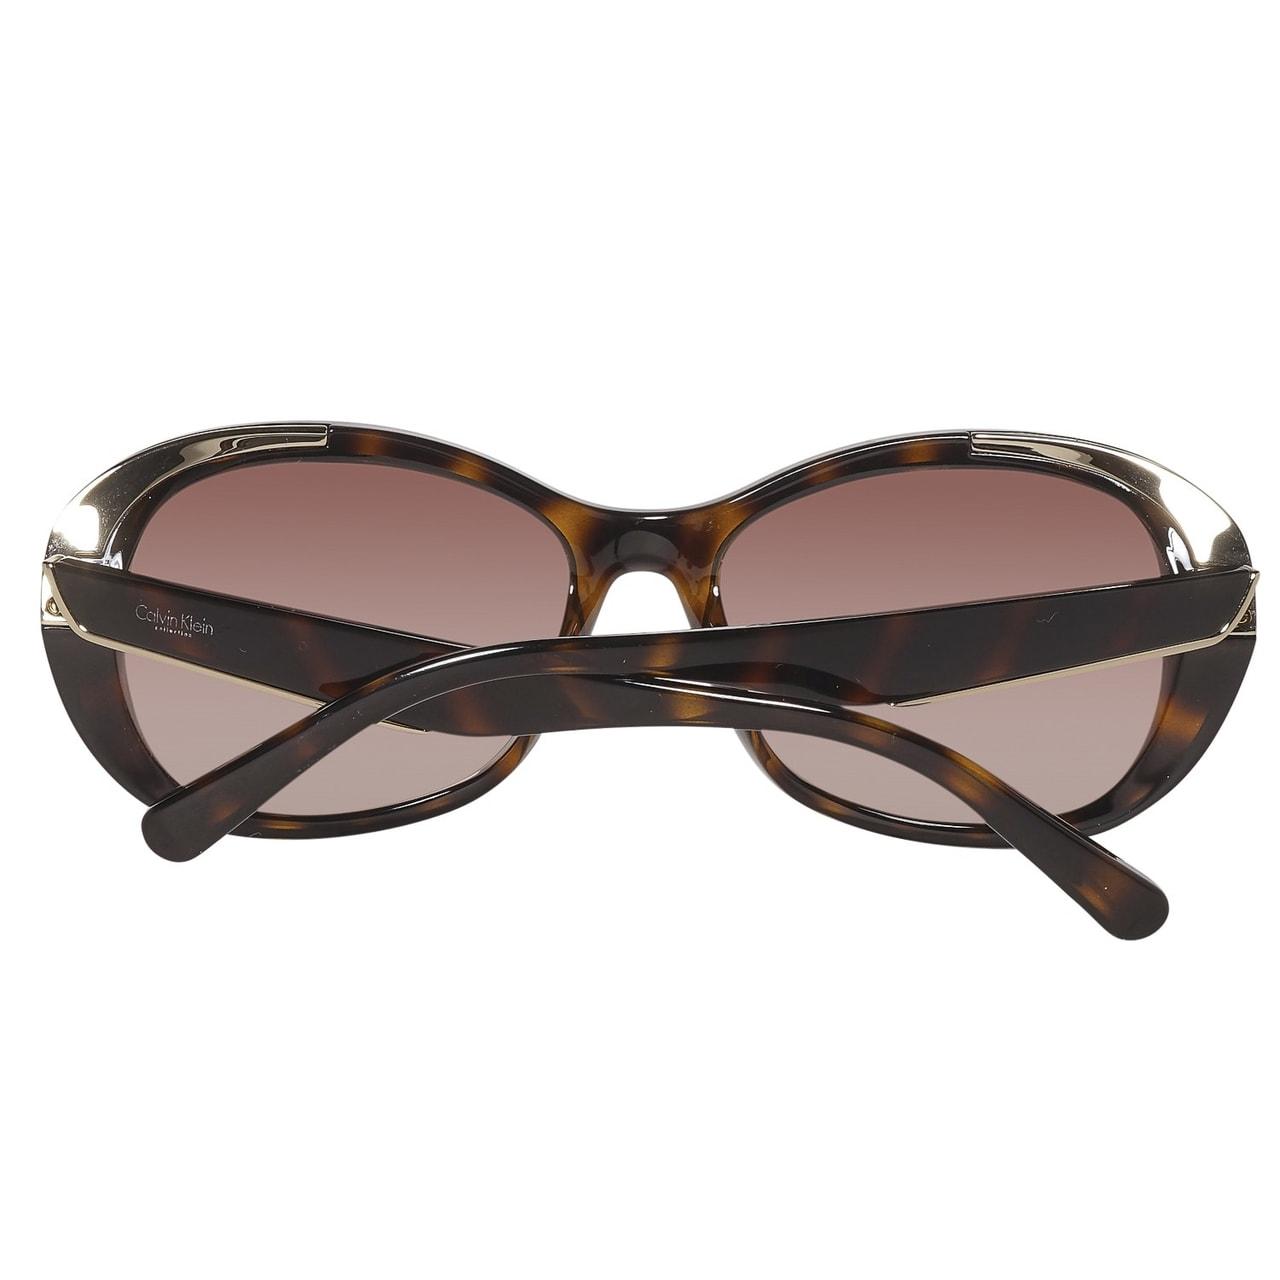 c4f157460 Glamadise.sk - Calvin Klein havana slnečné okuliare - Calvin Klein ...